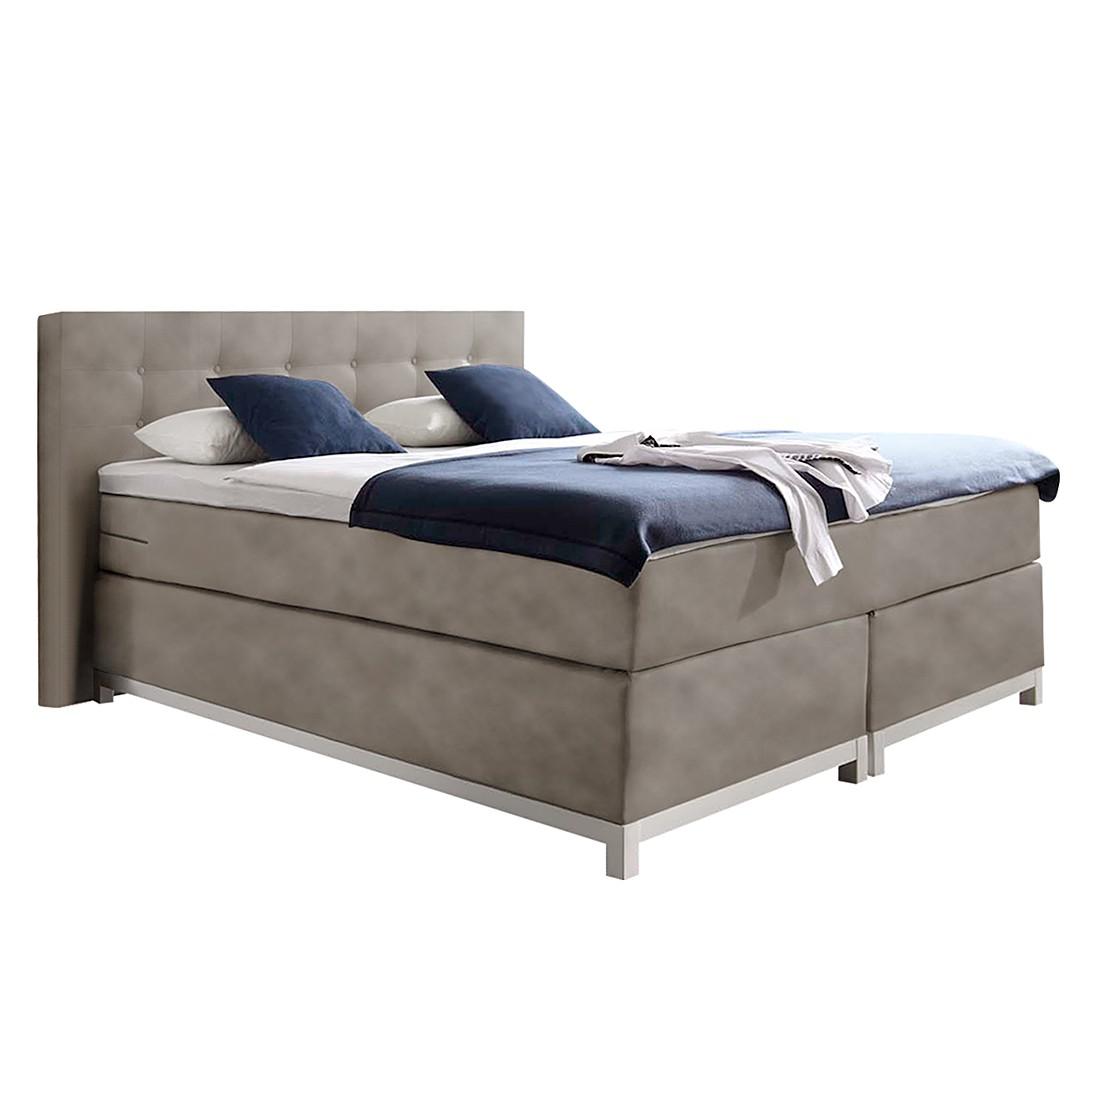 boxspringbett male kunstleder 140 x 200cm h3 ab 80 kg vintage sand nova dream sleepline. Black Bedroom Furniture Sets. Home Design Ideas